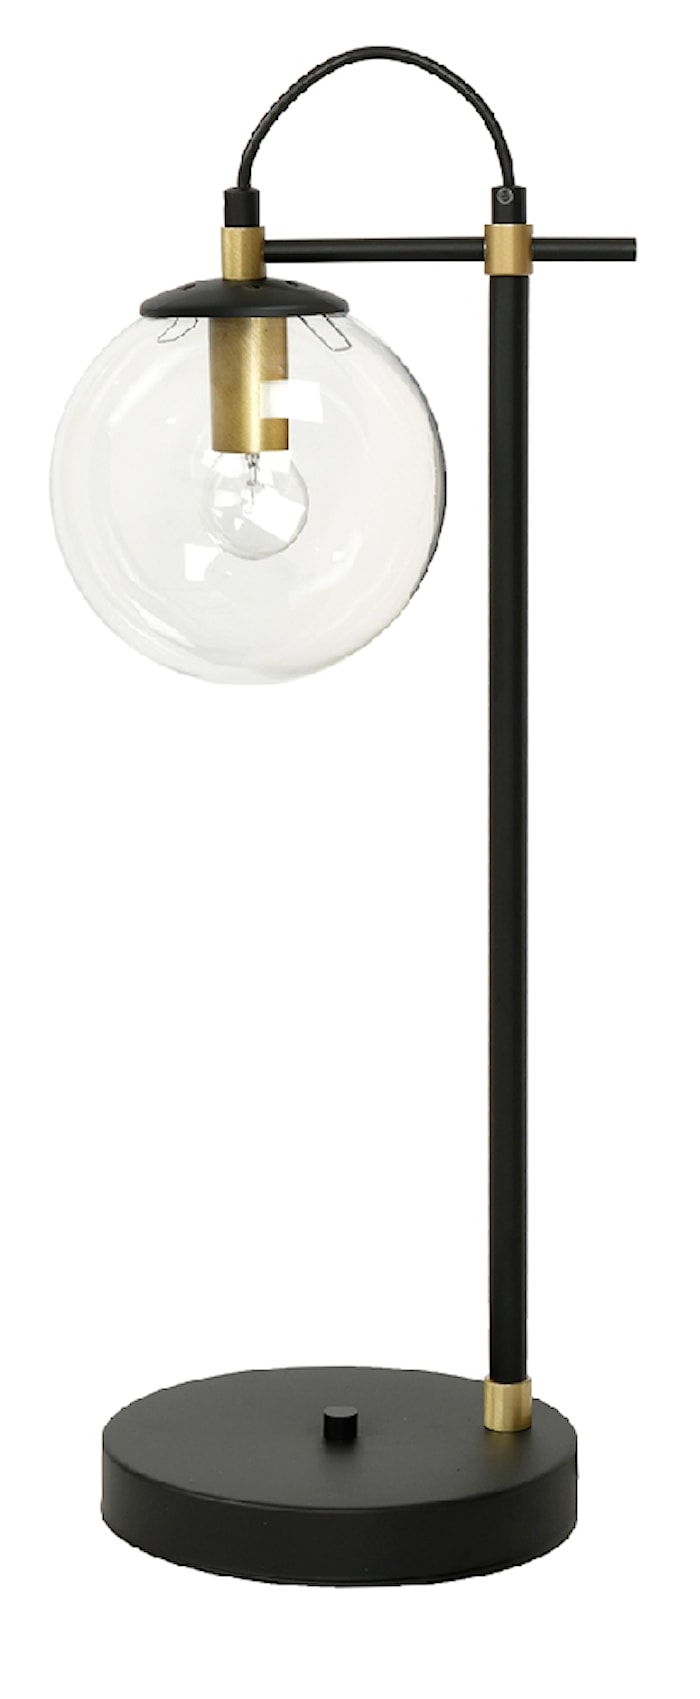 Perla 1 Bordslampa Glas/Mässing/Svart